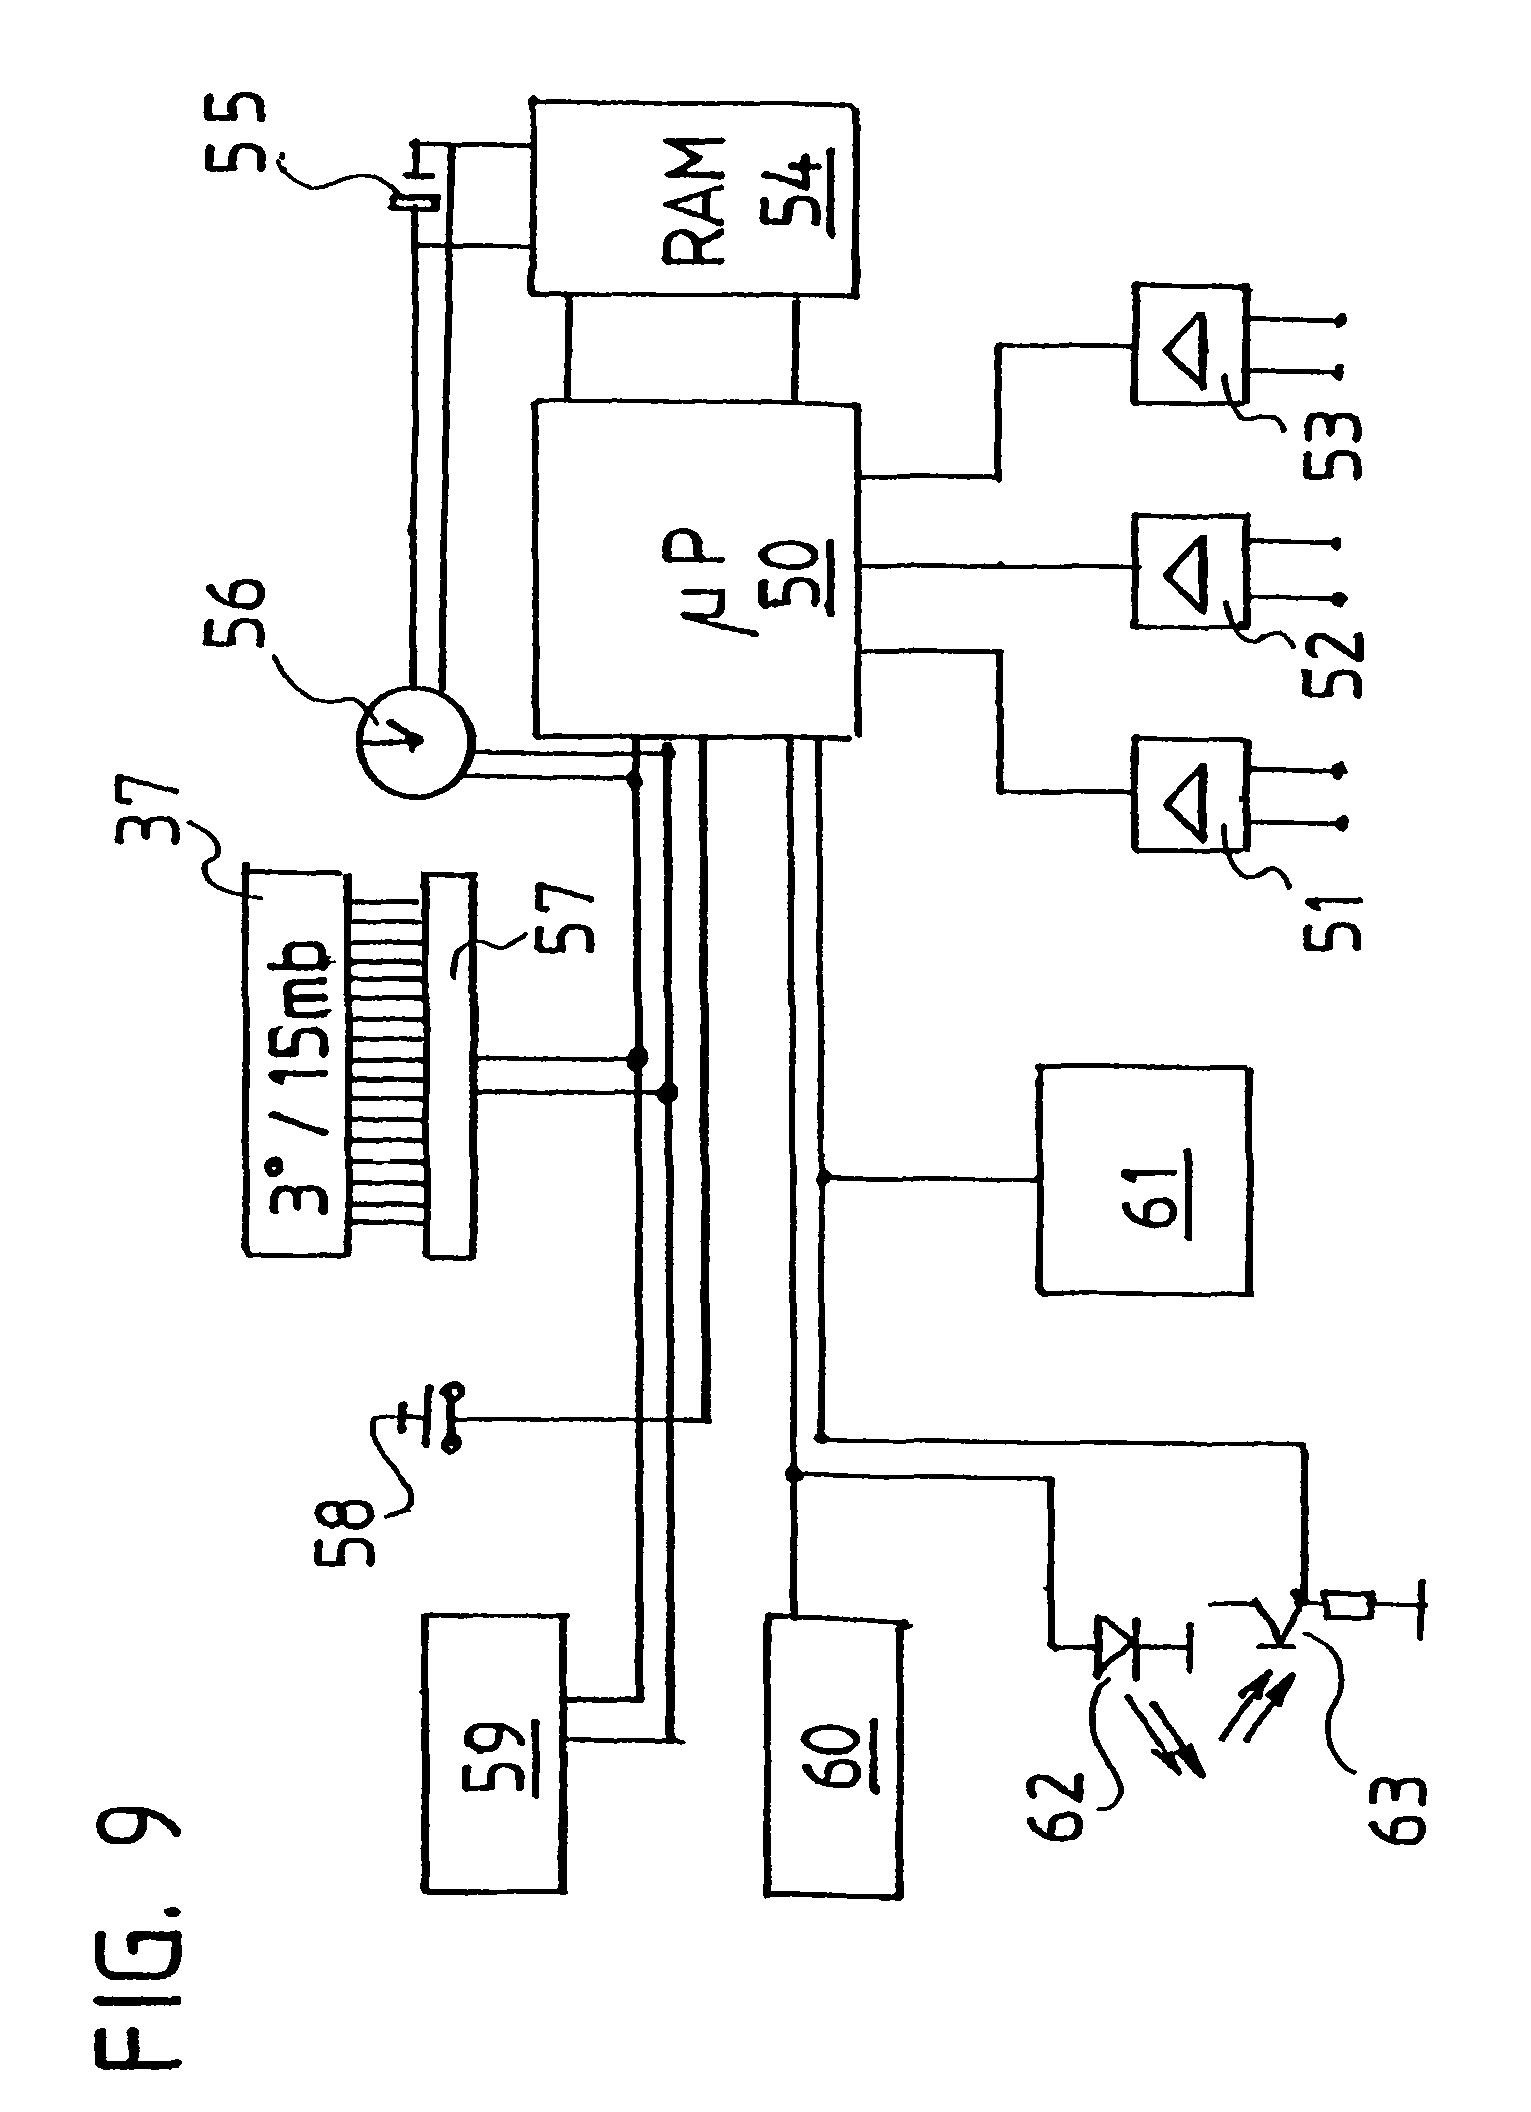 US20060231104 together with US7836876 additionally Ktcvlsitraining blogspot together with Vacuum Pump System Schematic QEWAeUrm0Zxp662UgVkJHnsxWXgnt14fXvJ4kk1MSrE together with Vacuum Forming Diagrams. on vacuum forming diagrams